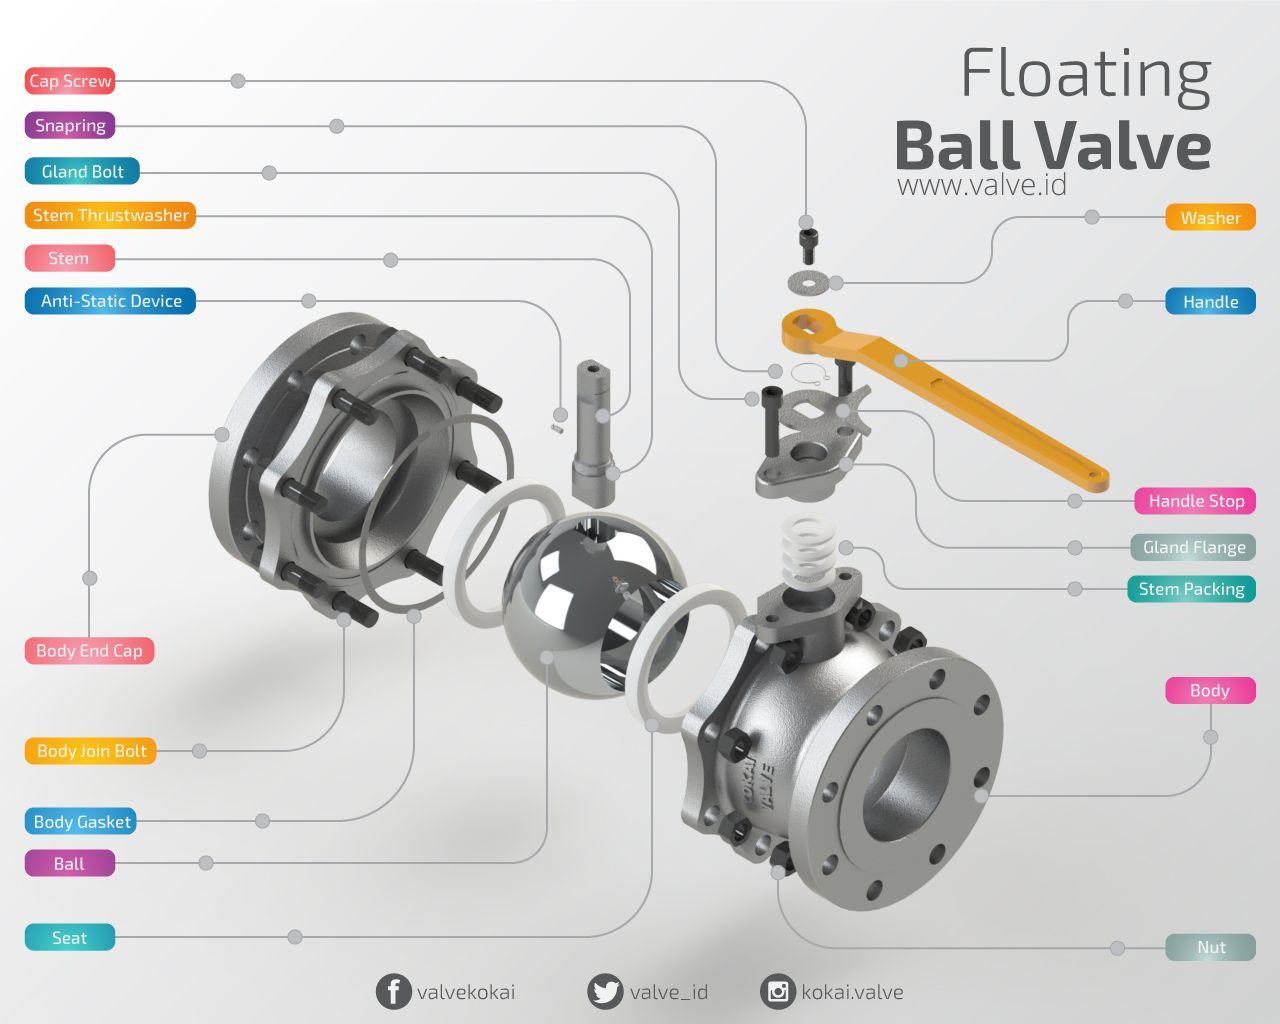 Kokai Valve Complete Solution For Industrial Valve For More Information Order Visit Www Valve Id Kokai Kokaivalve Valve Valves Industryvalve Ball